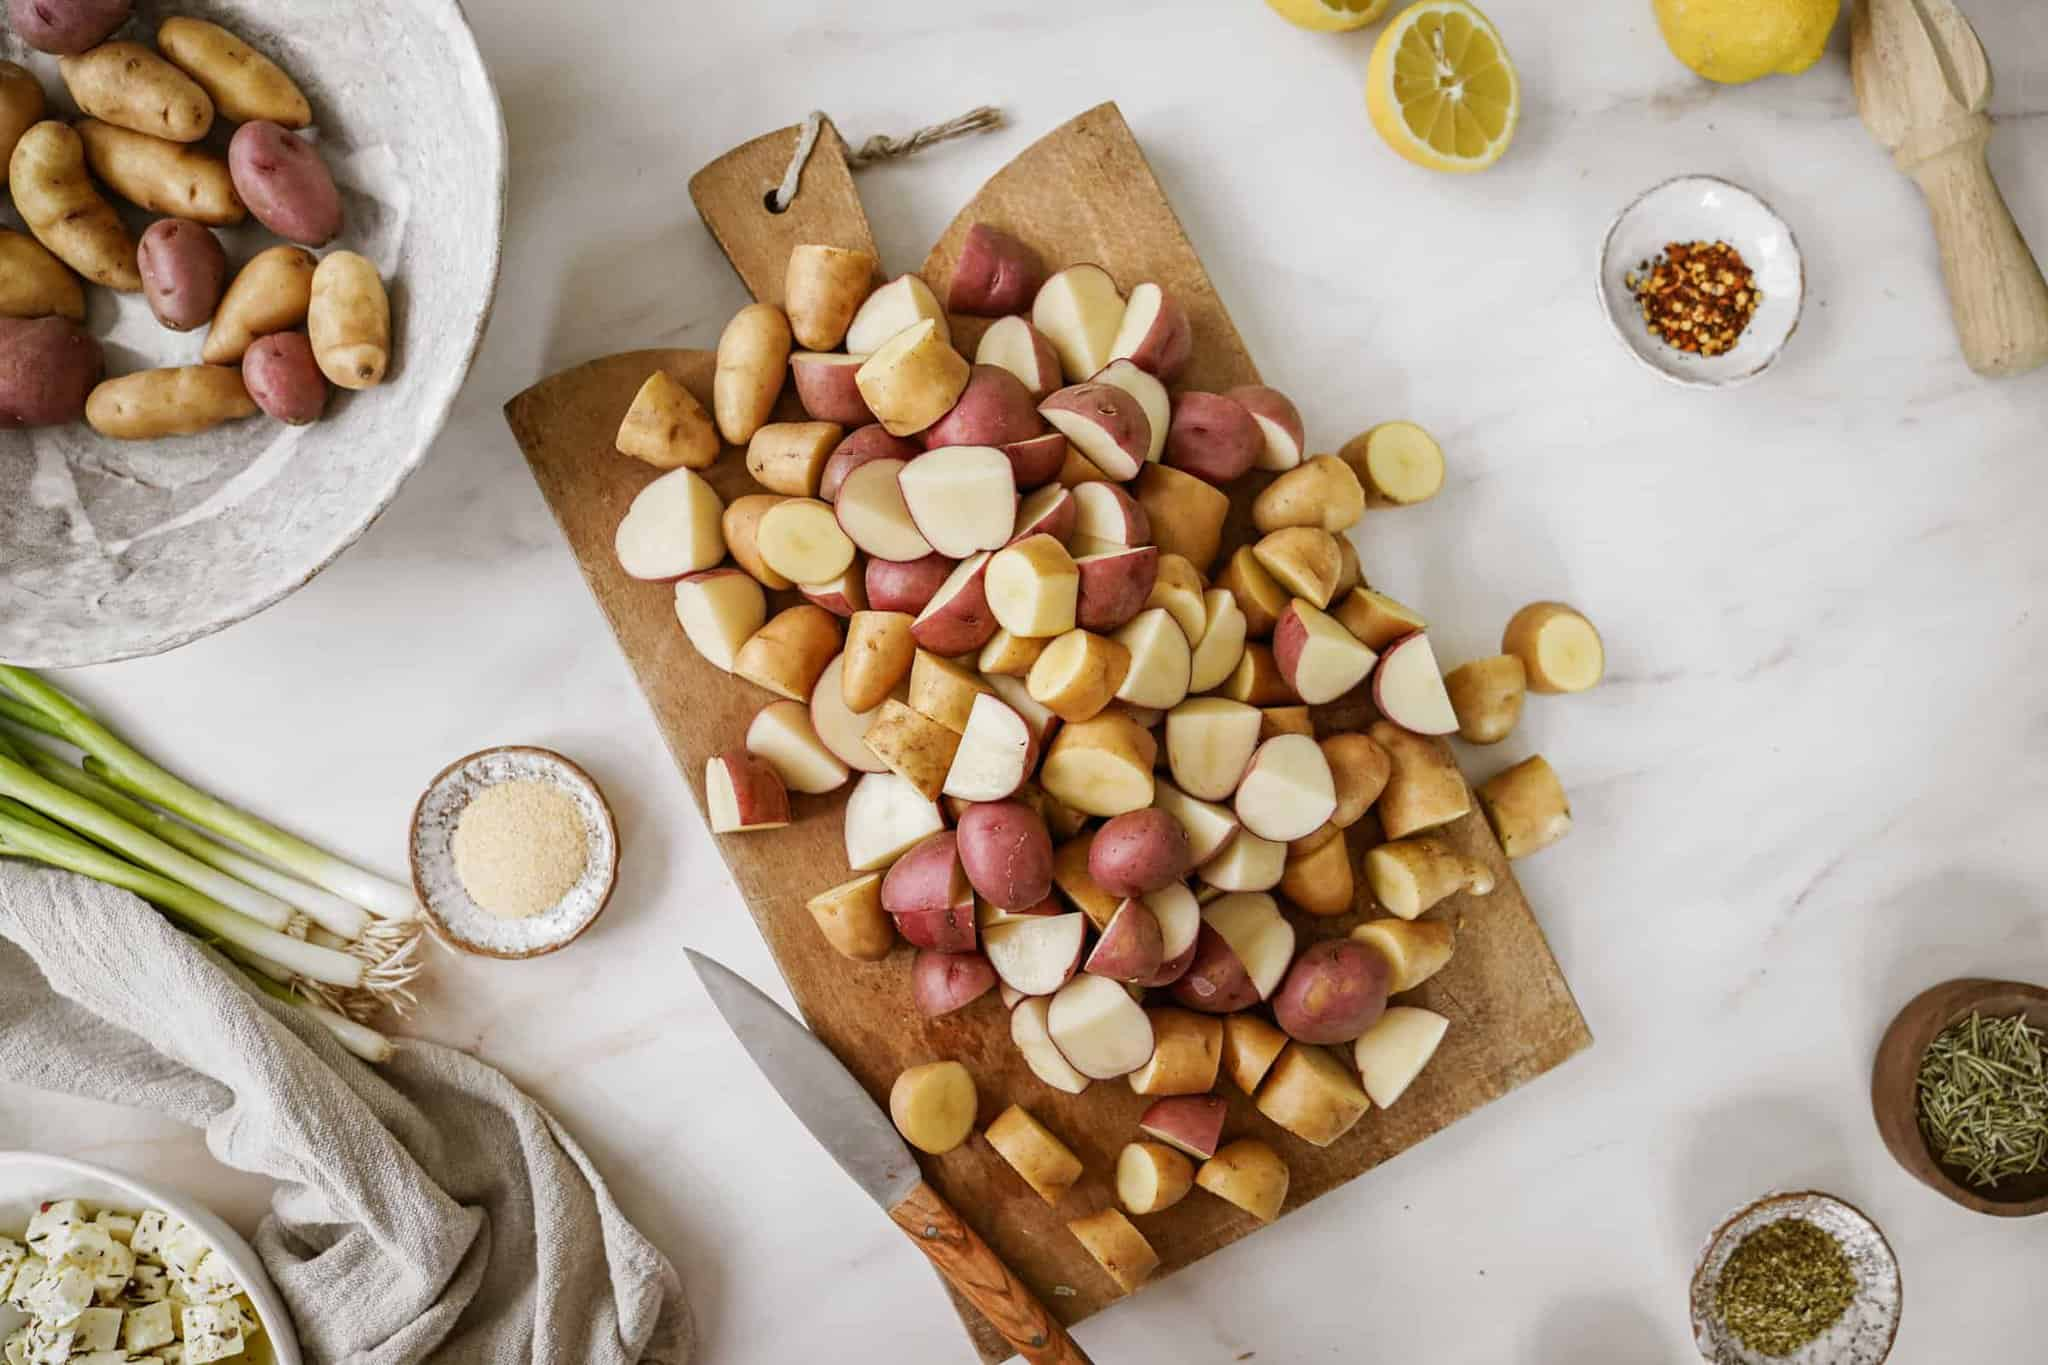 Cut potatoes on cutting board for Greek potato salad